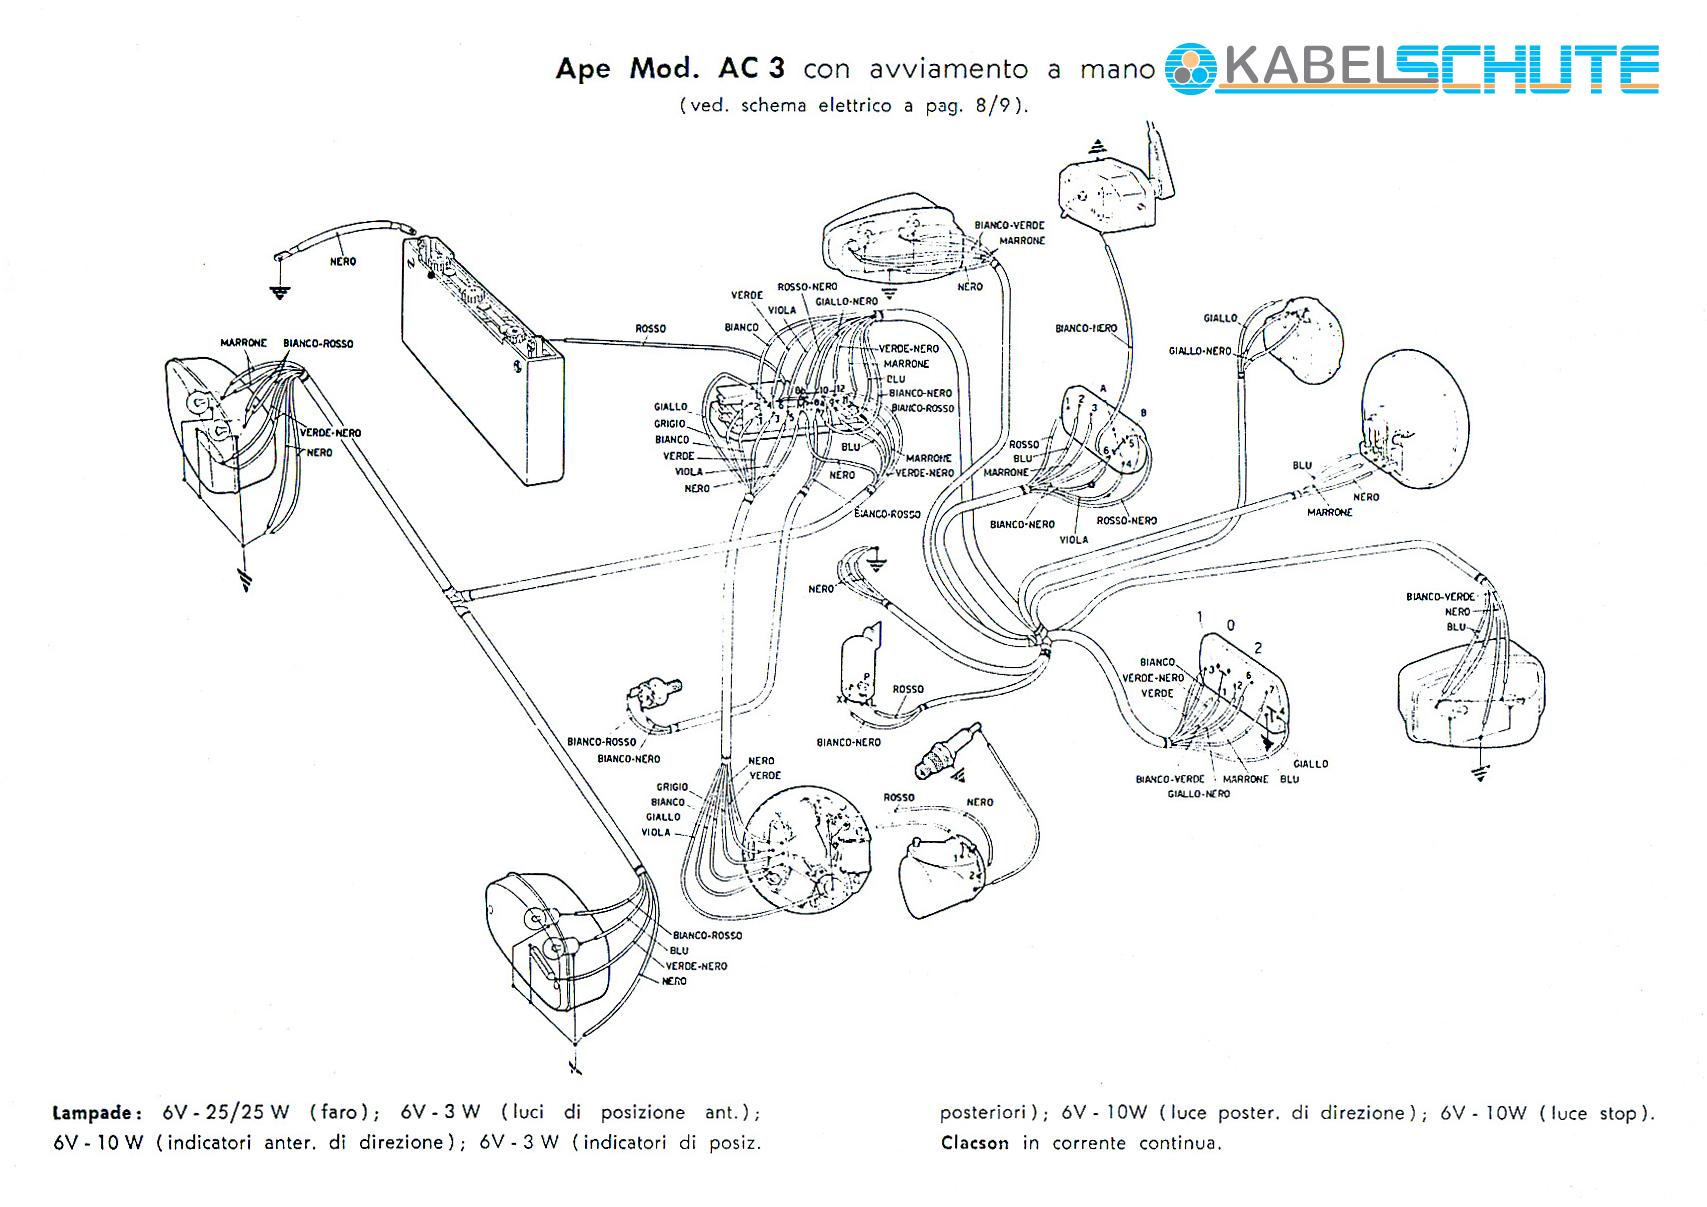 Vespa Et2 Wiring Diagram Trusted Diagrams Yamaha Vino Et4 And Schematics Carburetor Extraordinary